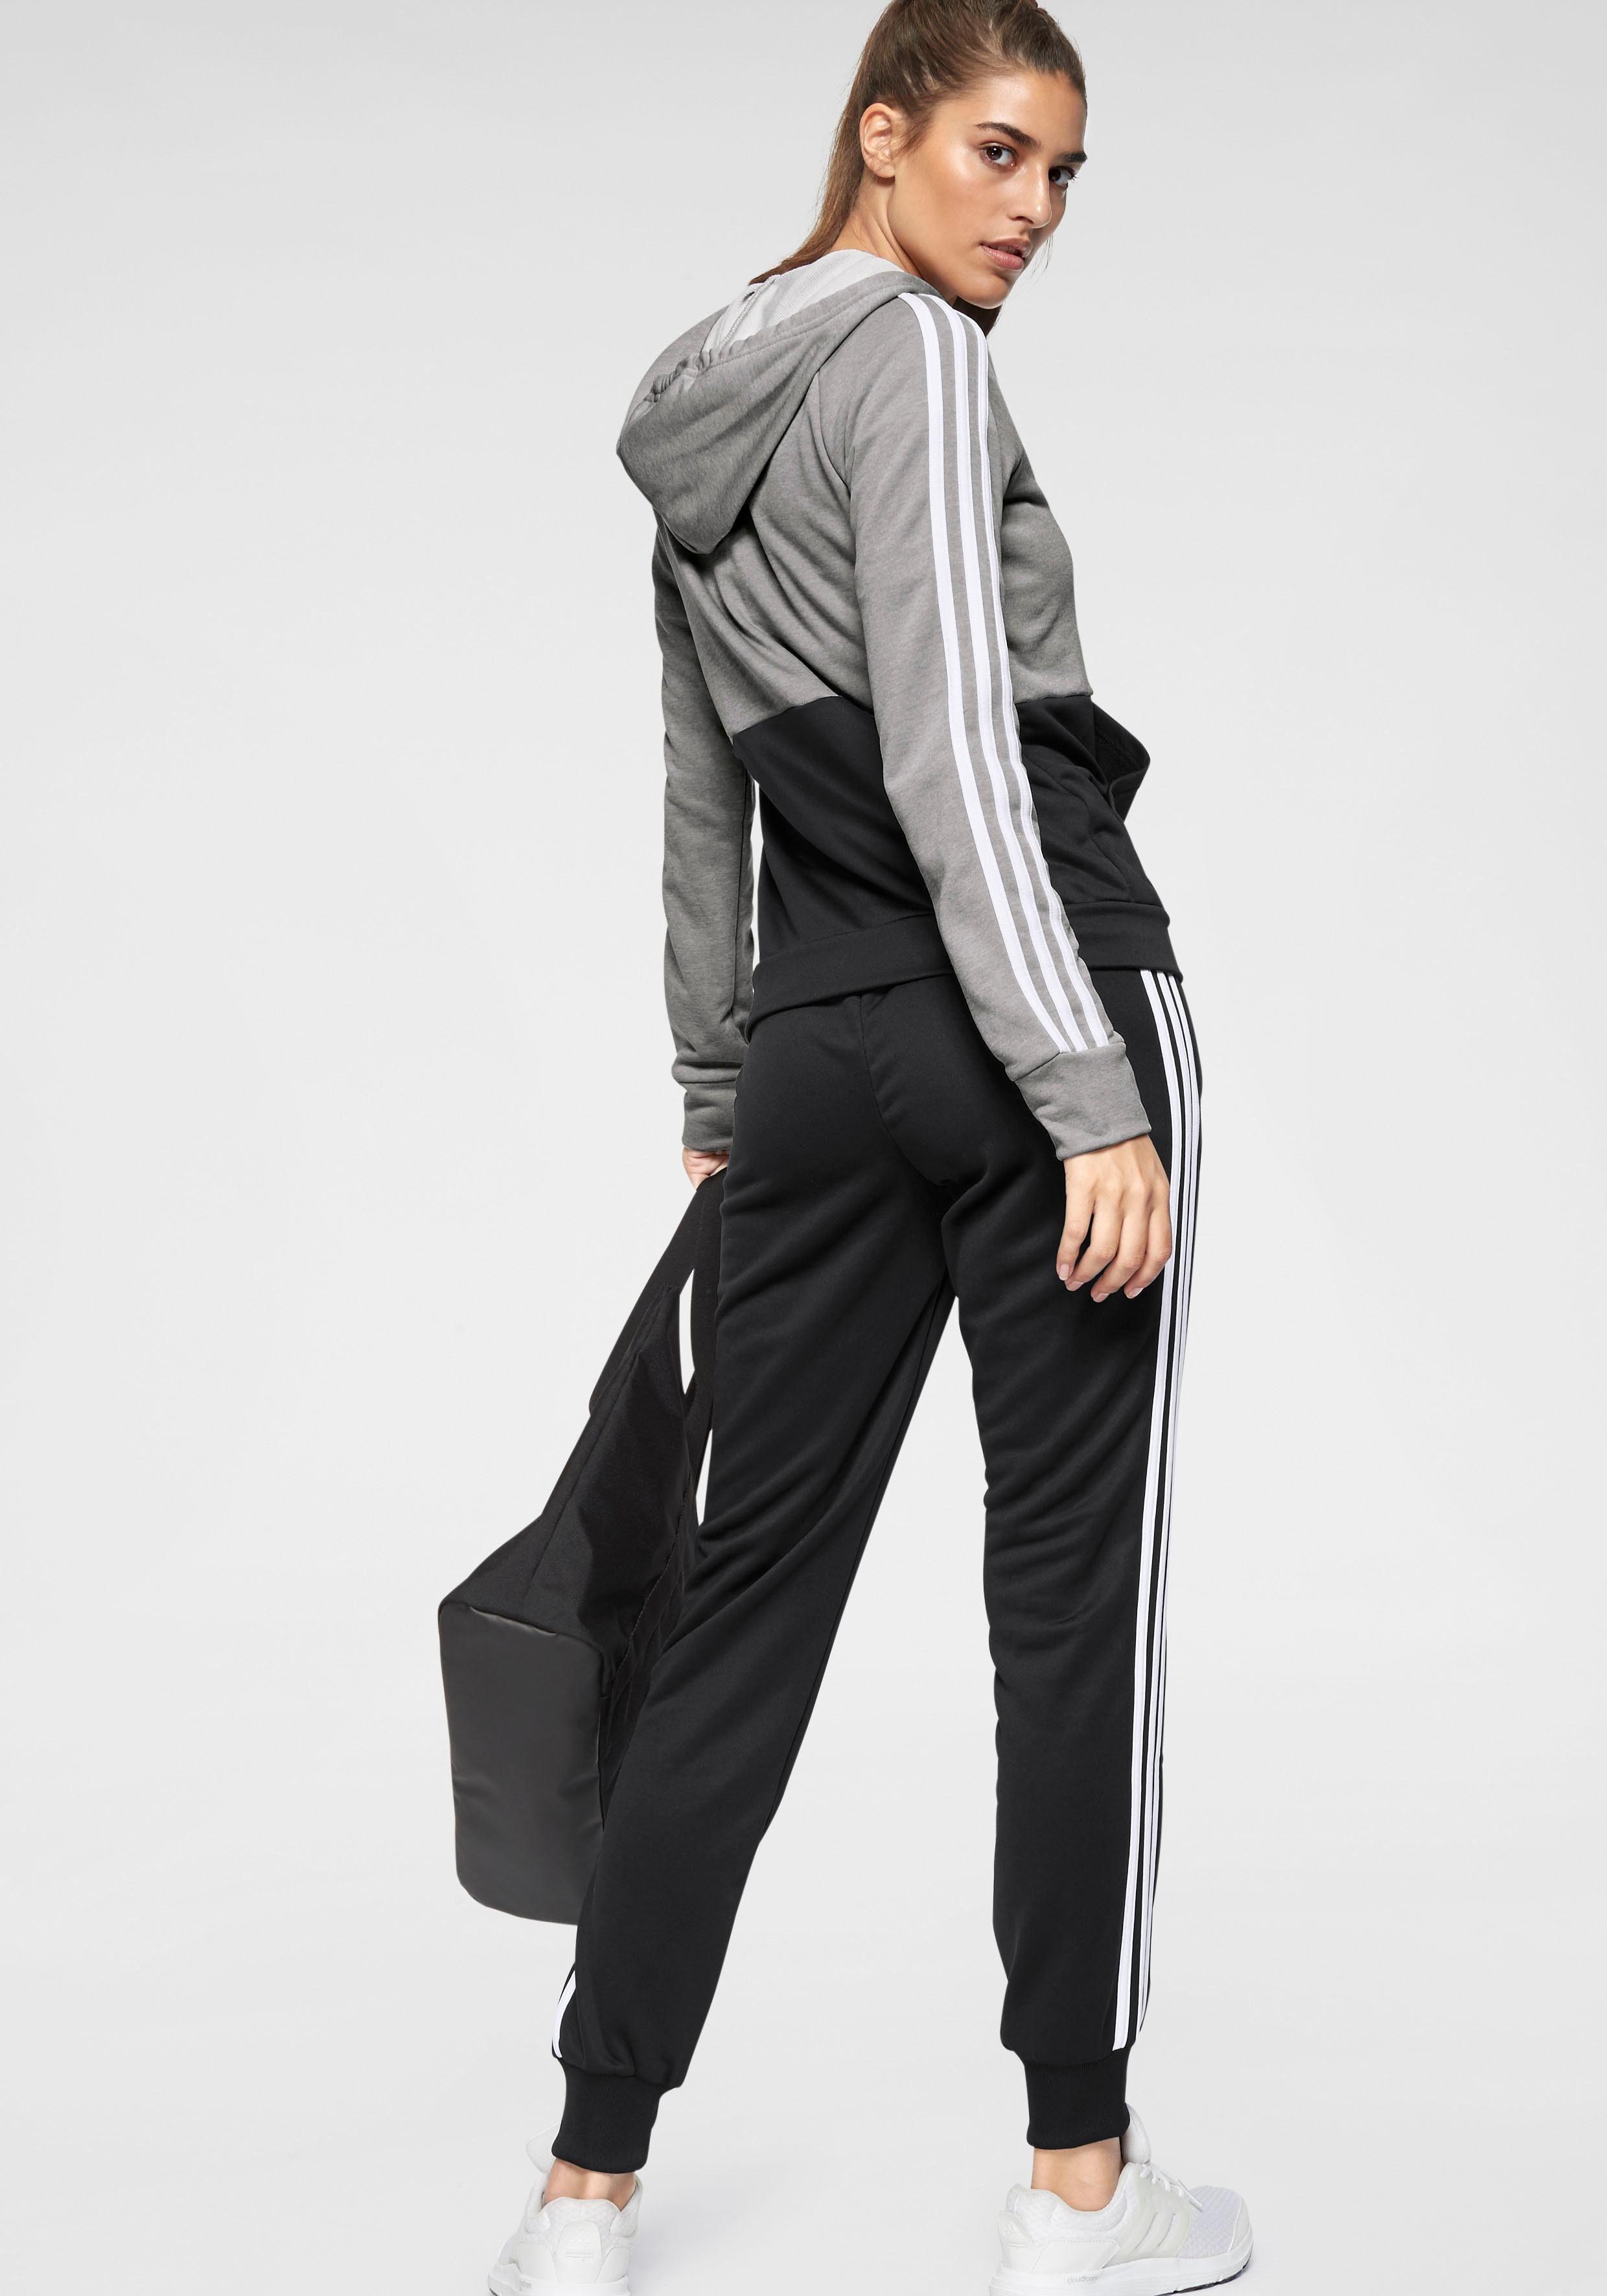 adidas trainingspak dames otto